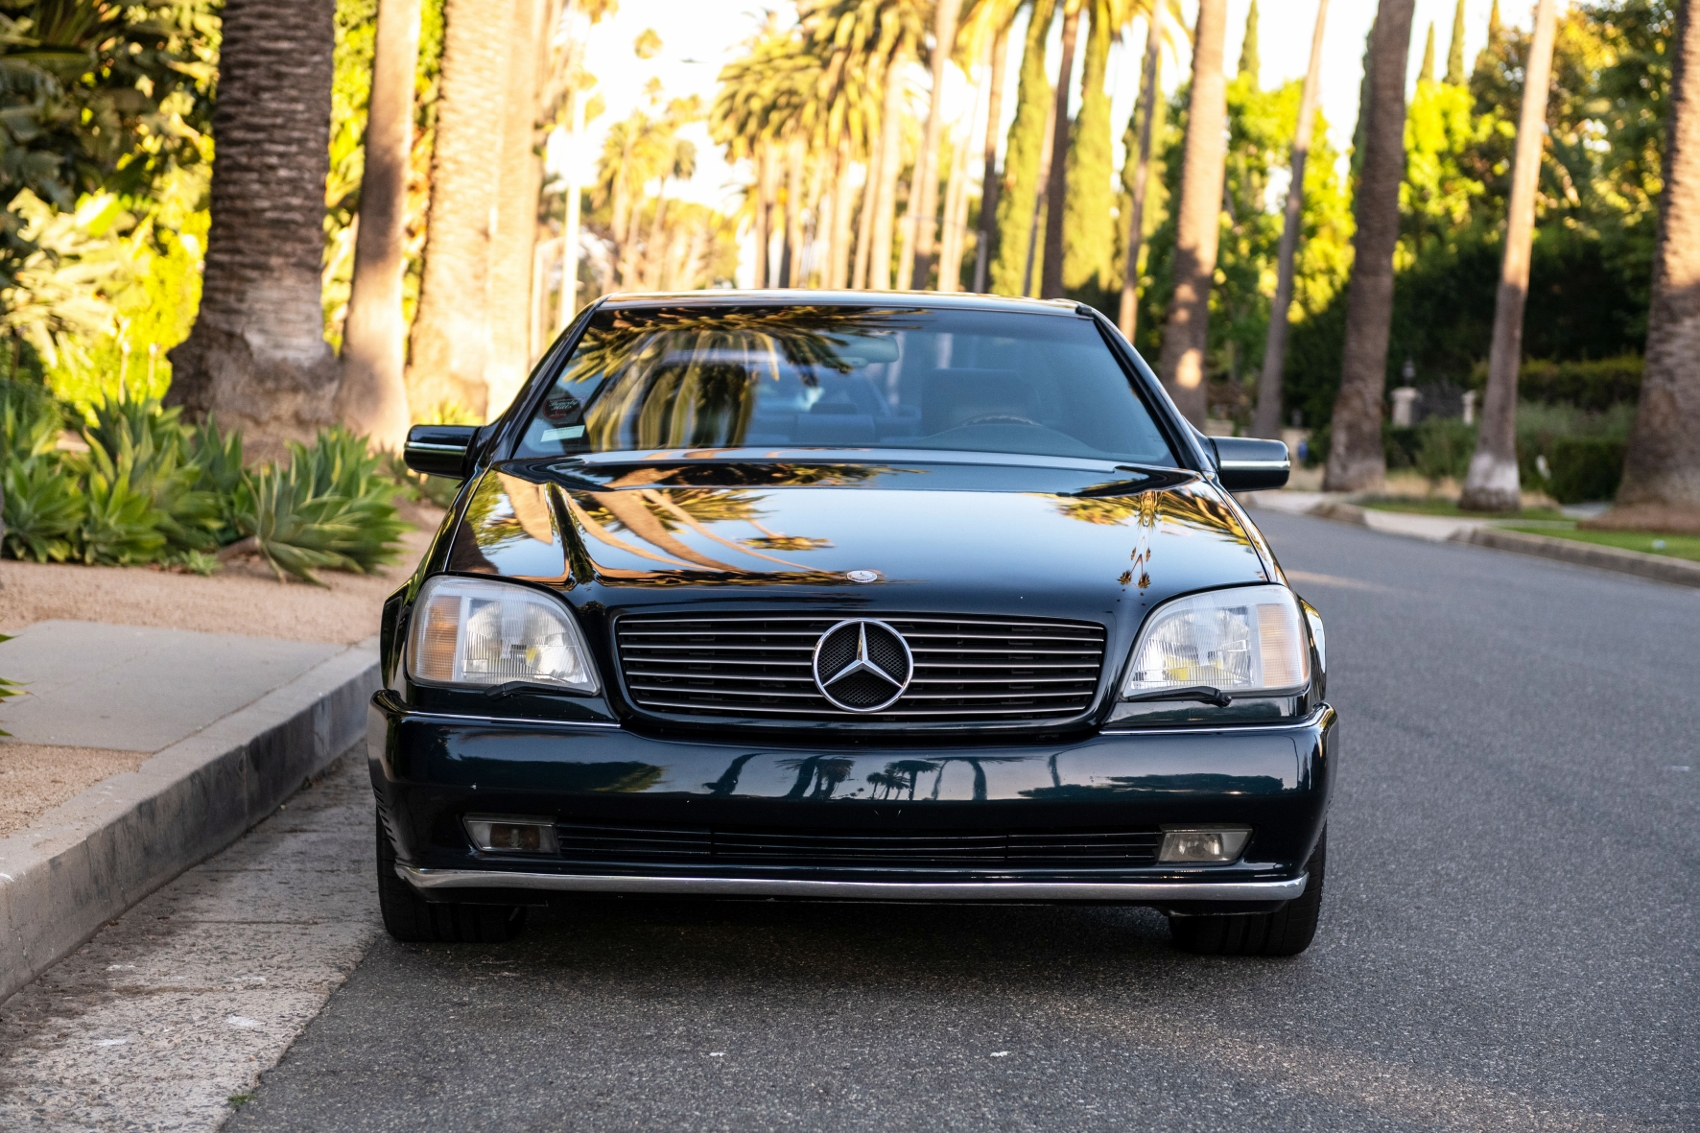 Pozrite si Mercedes S600 Michaela Jordana z roku 1996 hHGluC0UrU lorinsercl600ex-jordanfront3sbeverl